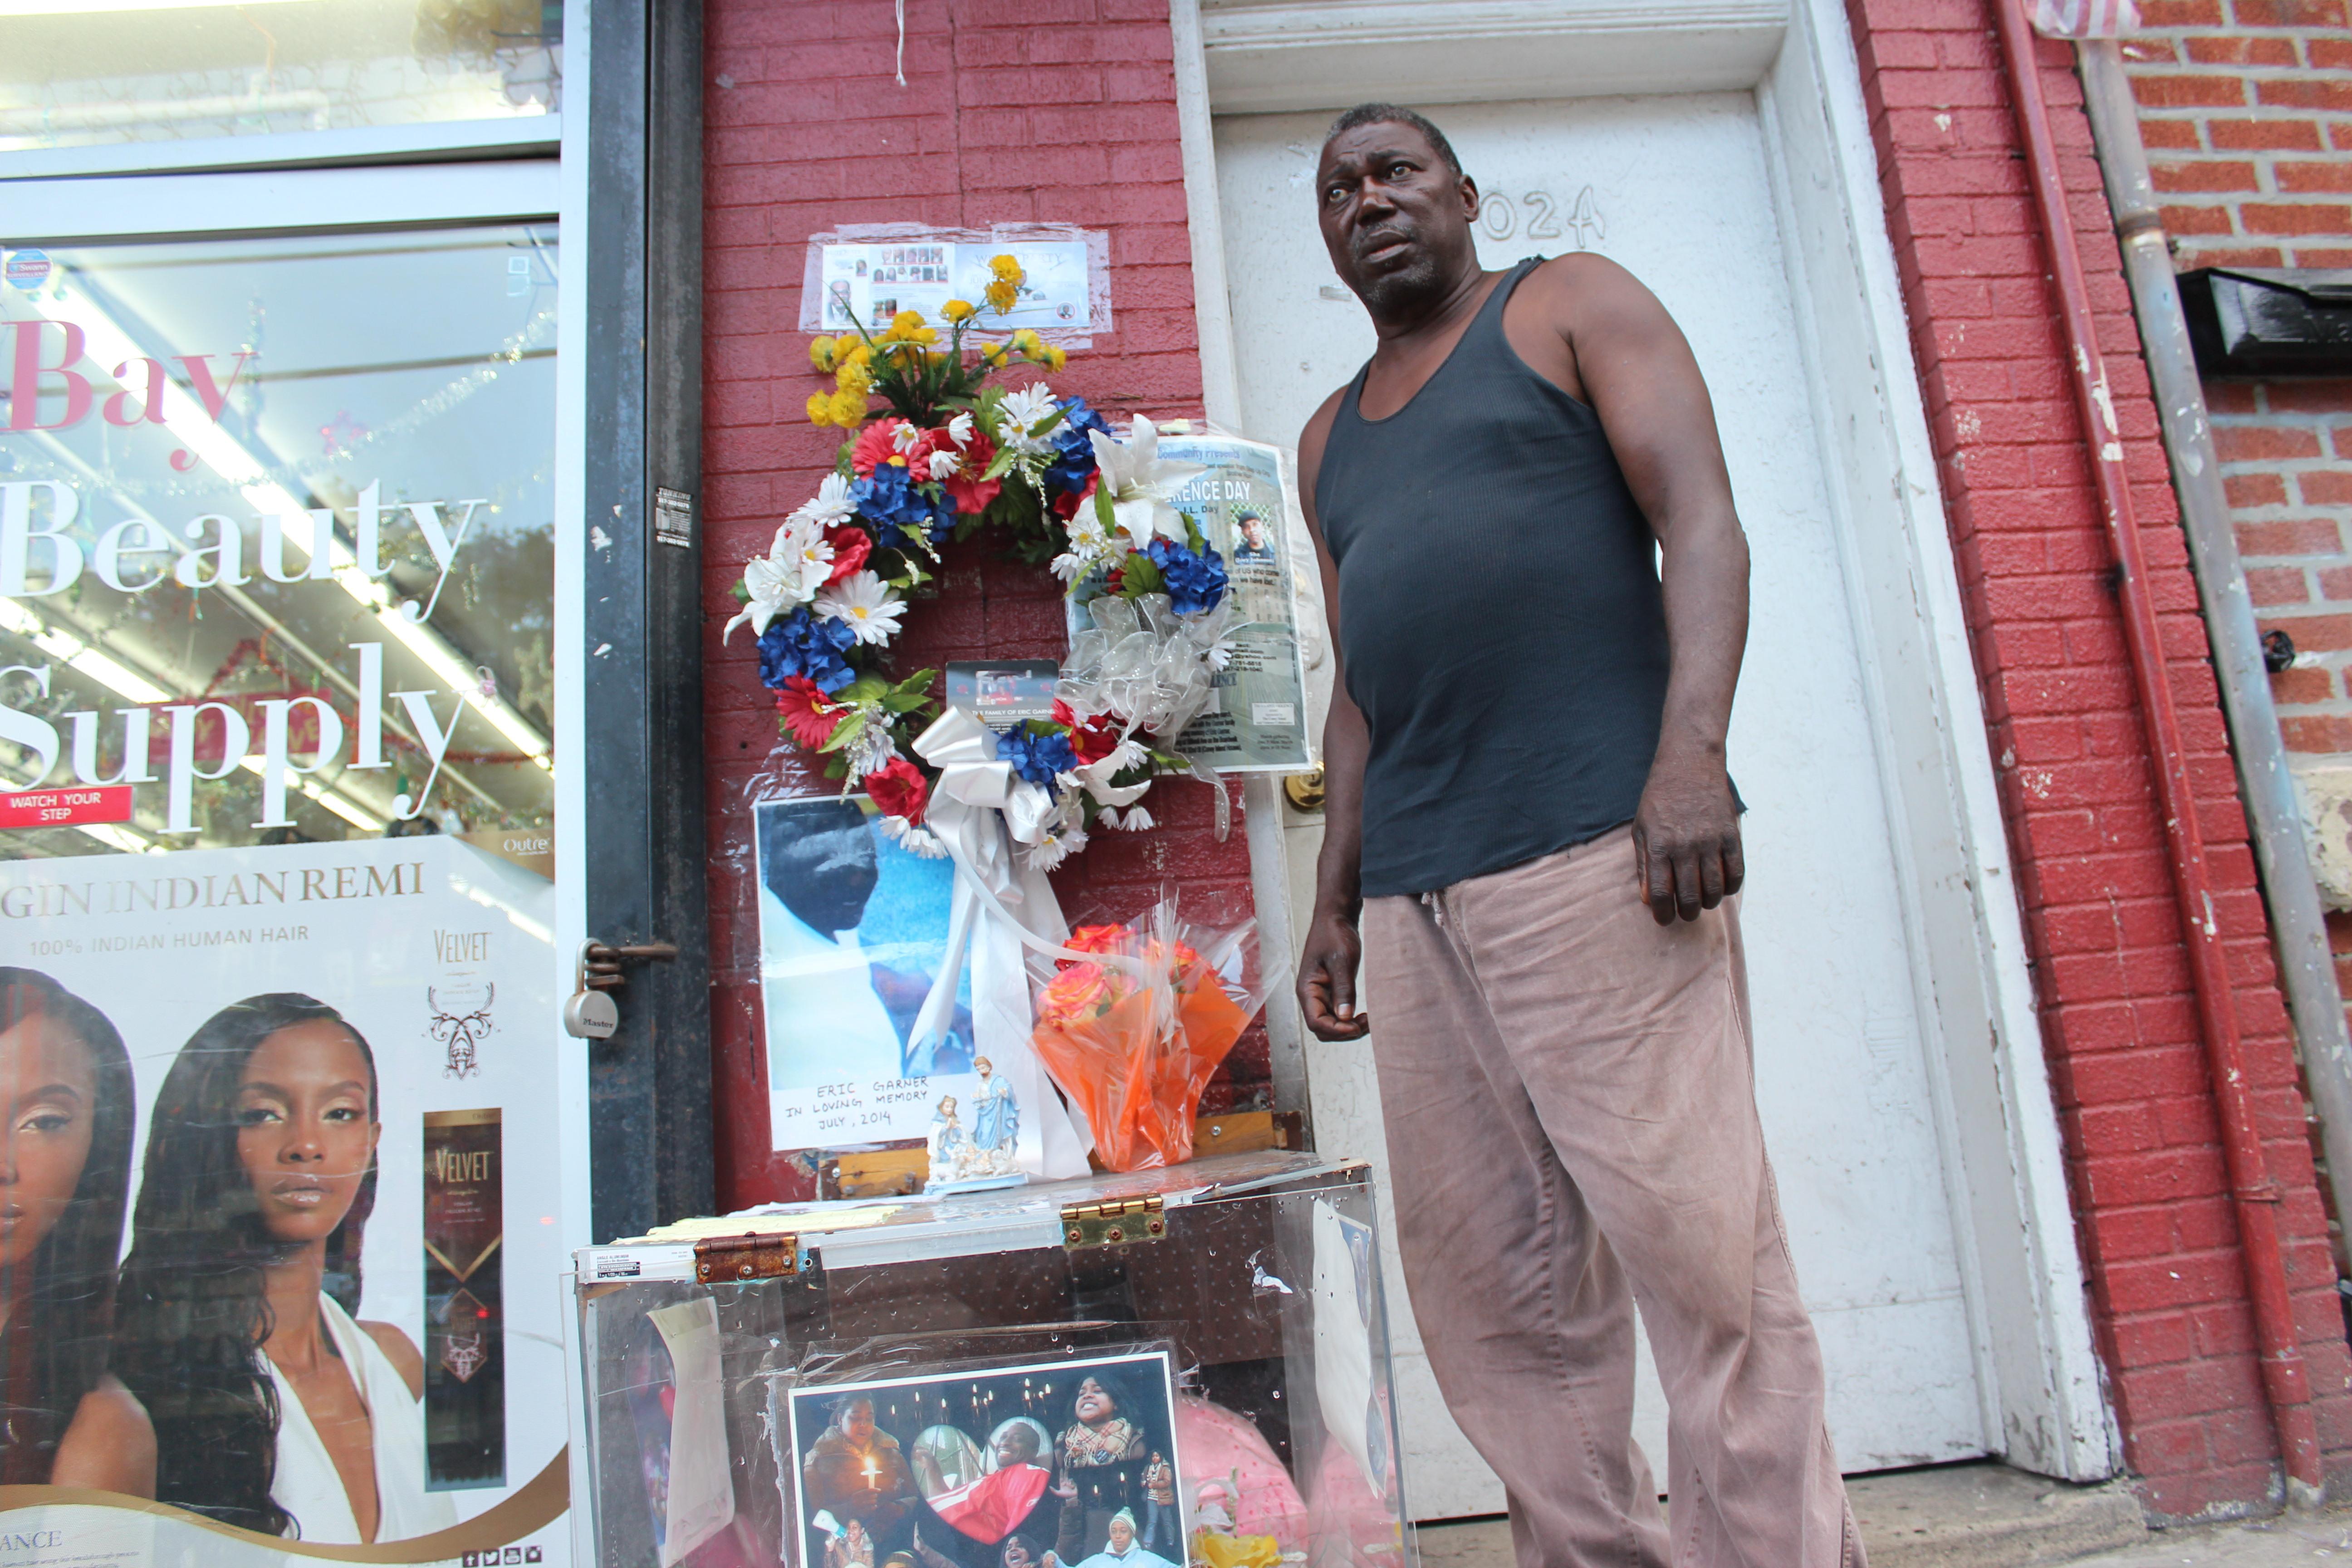 Eric Garner: One year later